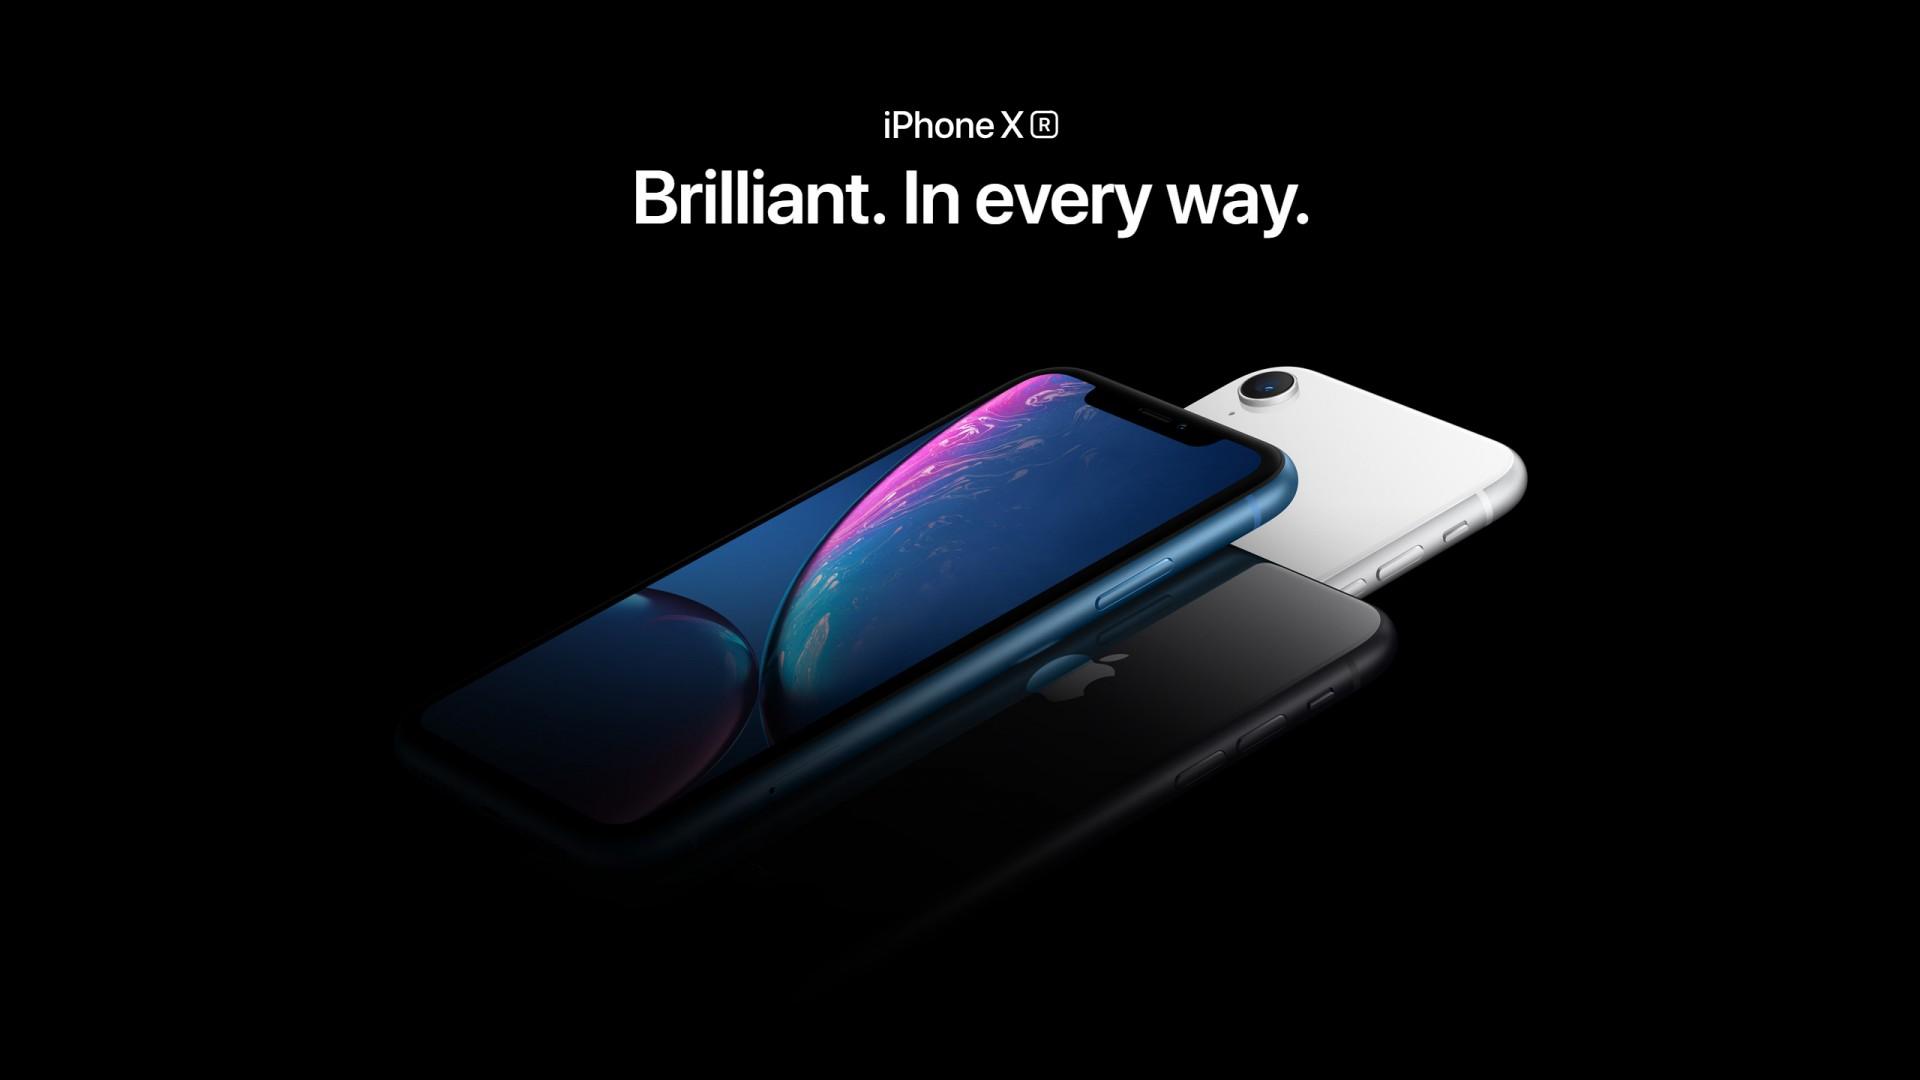 Wallpaper Iphone Xr Blue Black White Smartphone Apple